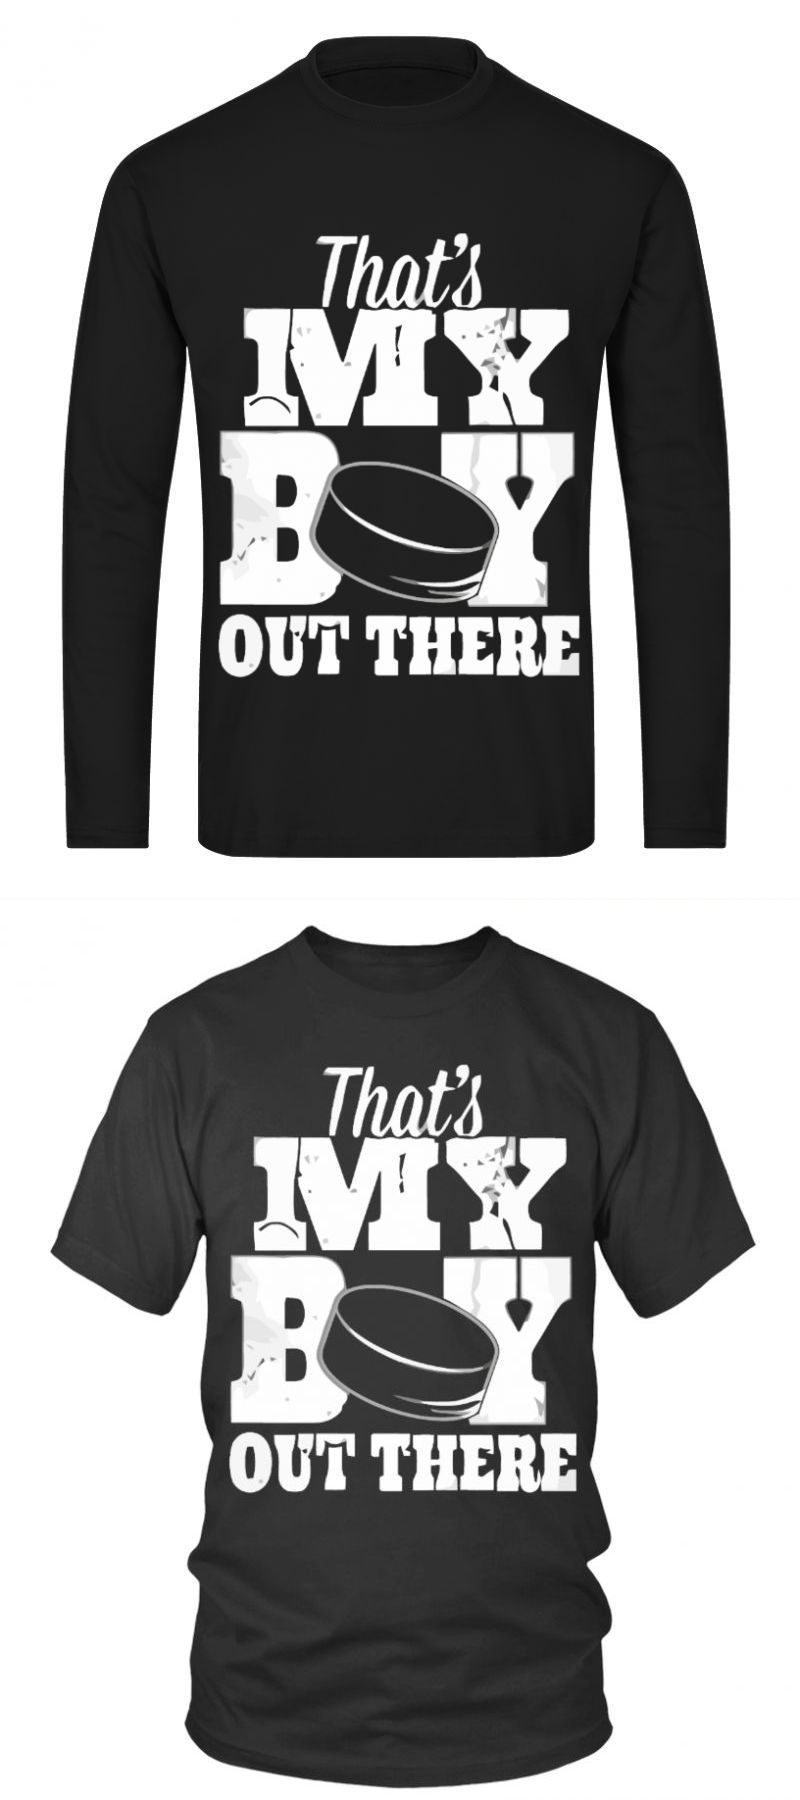 Men 039 S Hockey T Shirt Hockey My Boy Limitierte Edition Team North America Hockey T Shirt Men 039 S Hockey Shirt My Bo Hockey Tshirts Shirts T Shirt